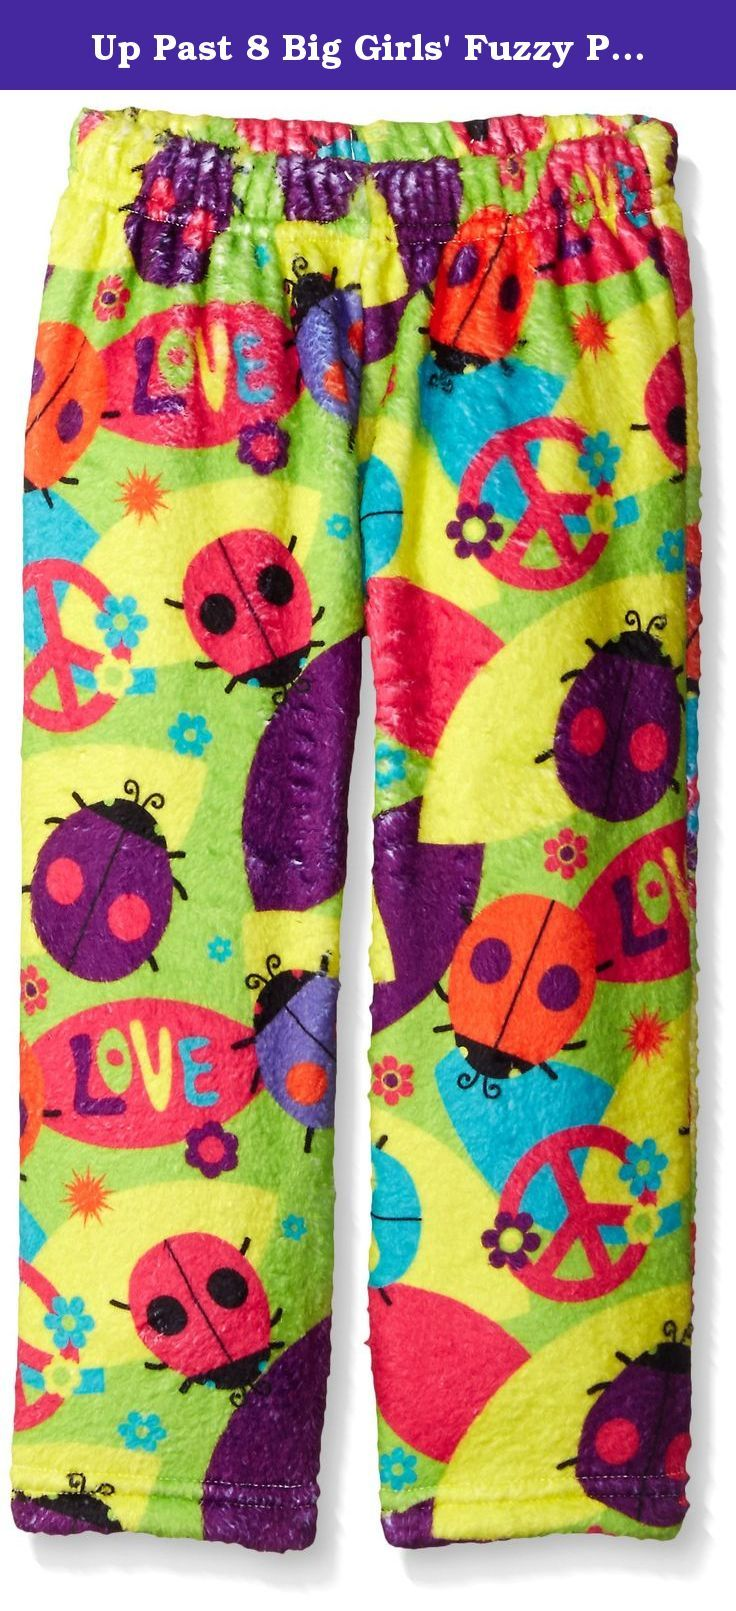 b61dc4039b Up Past 8 Big Girls  Fuzzy Pajama Pant